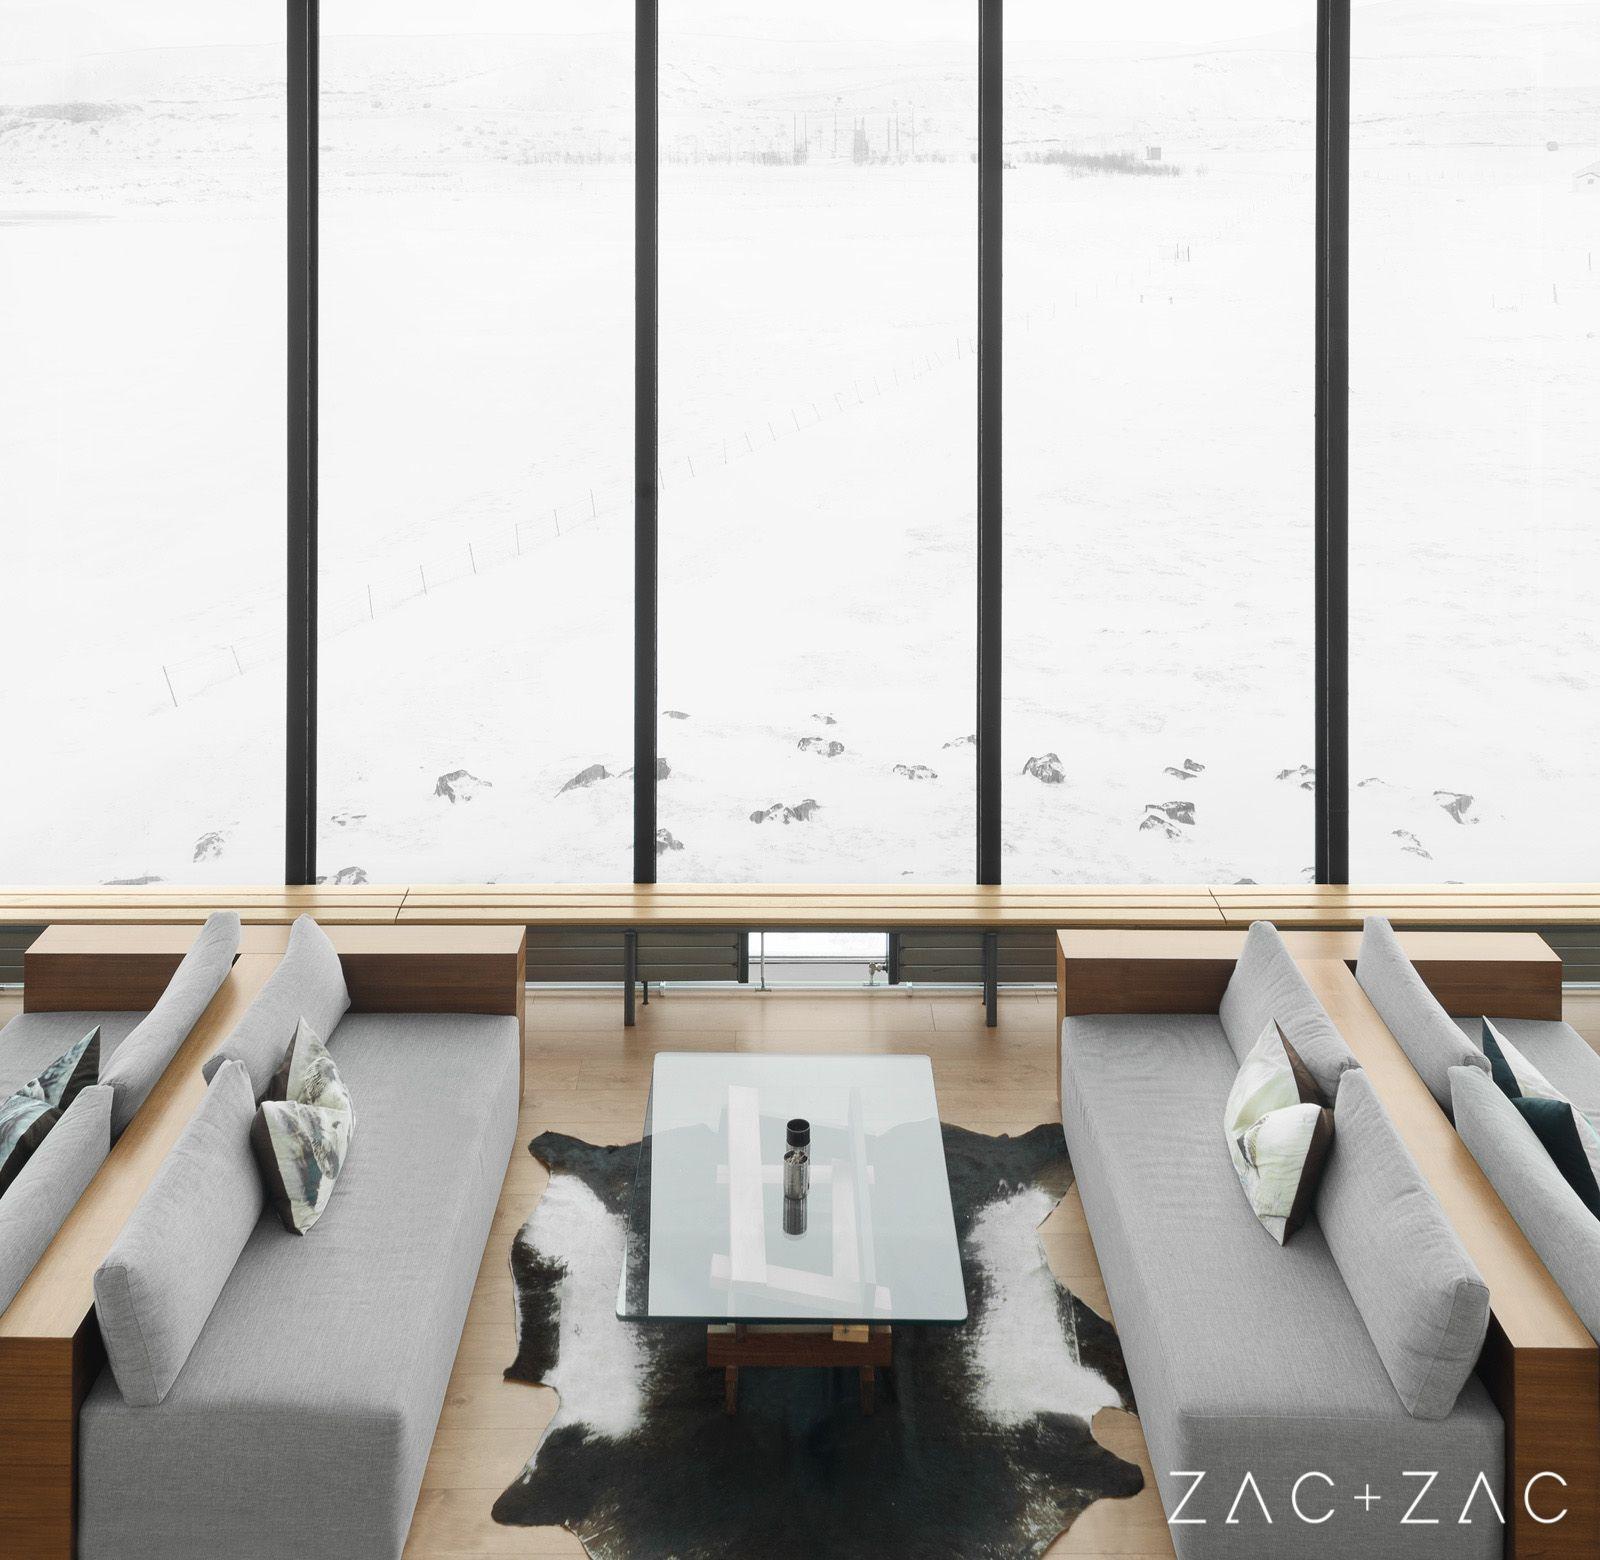 Sigurlaug Sverrisdottir Ion Iceland Original - Luzhai Hotels - Pinterest